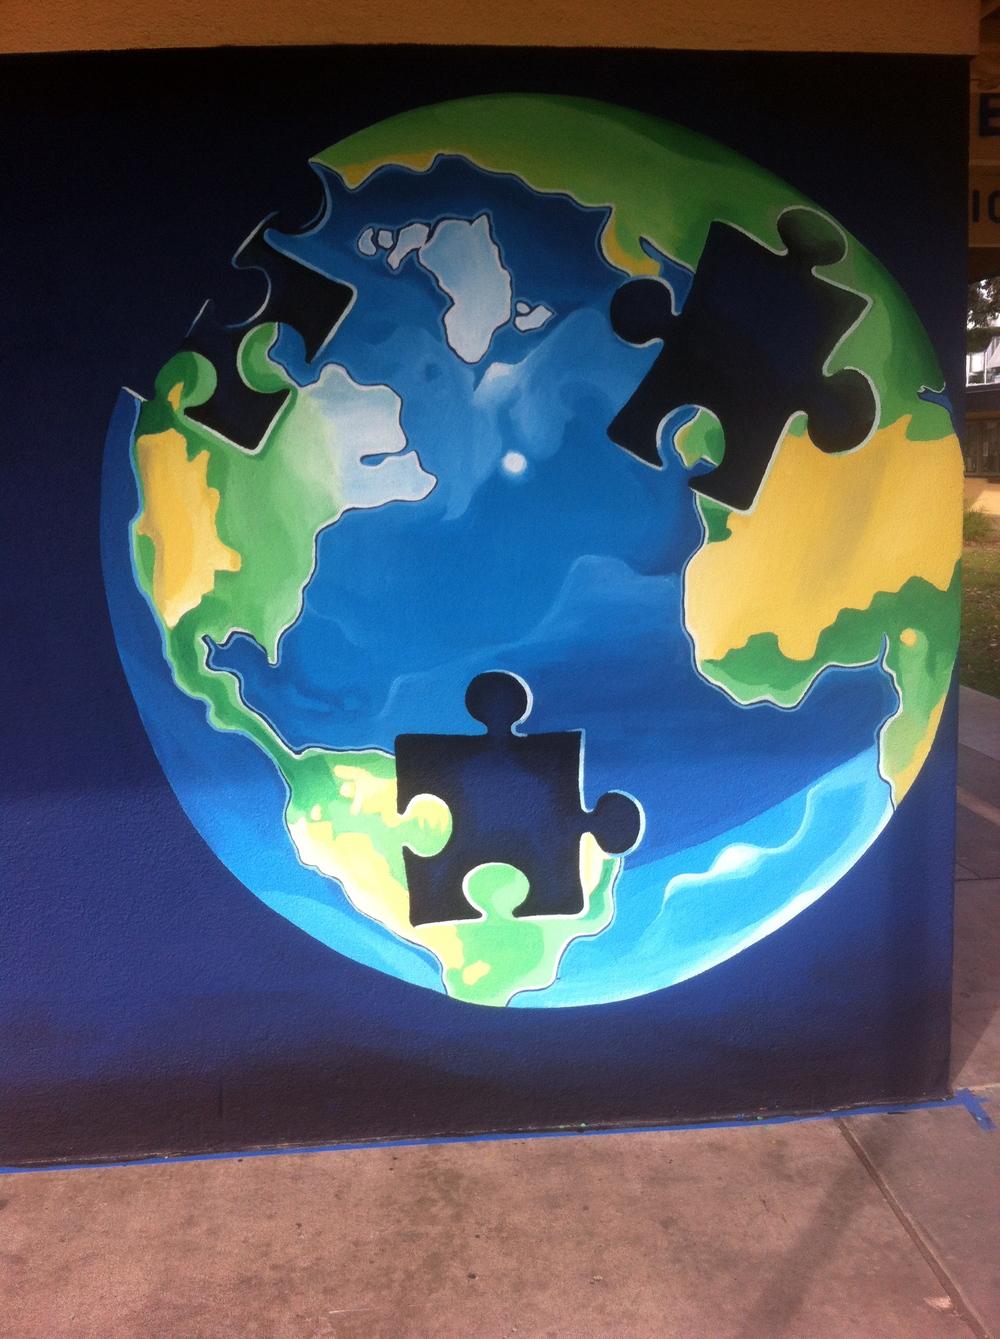 Puzzle Globe. Exterior Wall, Stucco. 7' x 7'